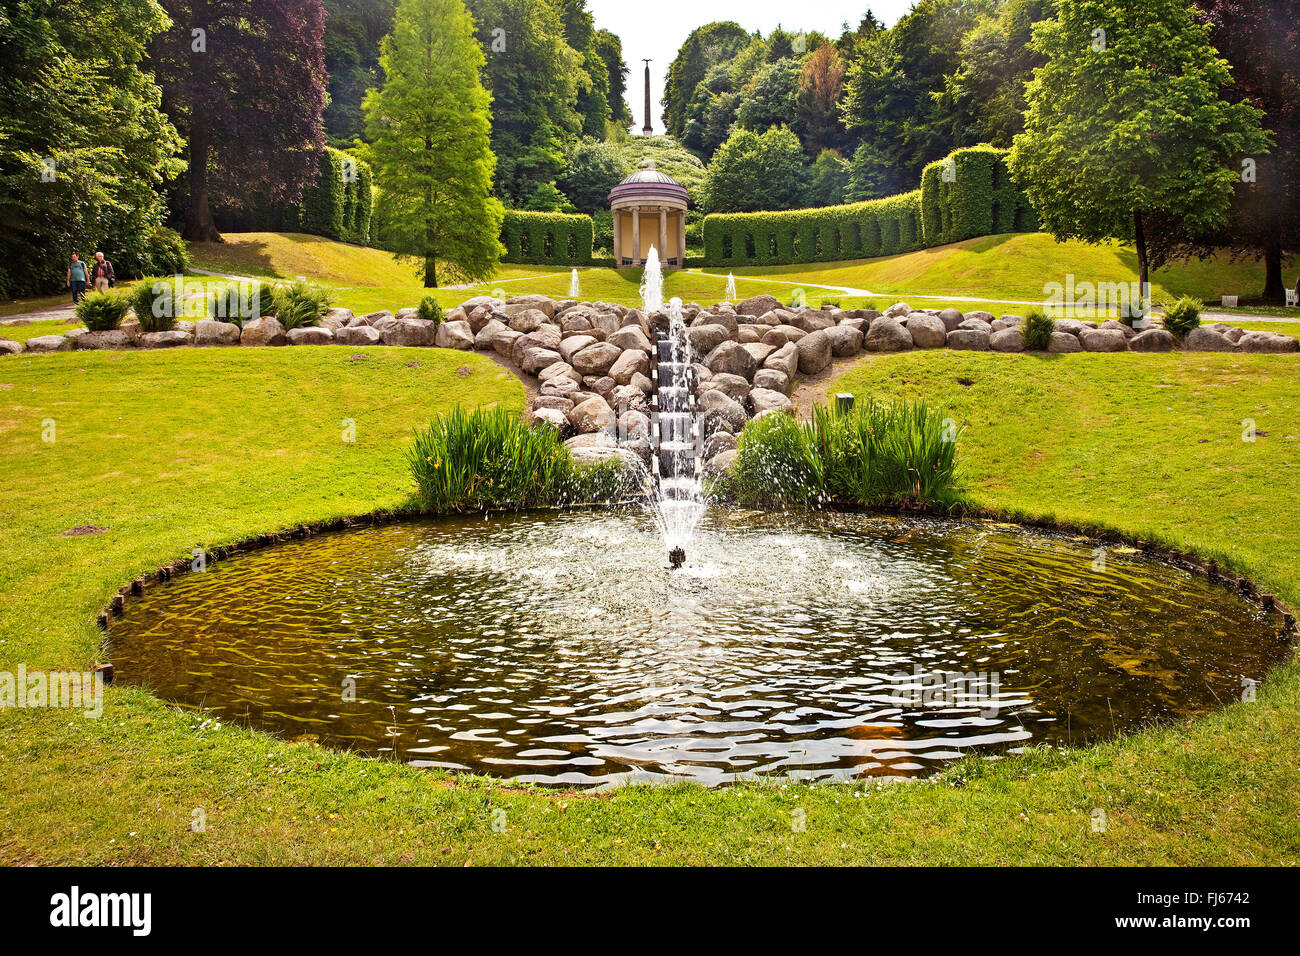 Neuer Tiergarten park, Germany, North Rhine-Westphalia, Lower Rhine, Cleves - Stock Image